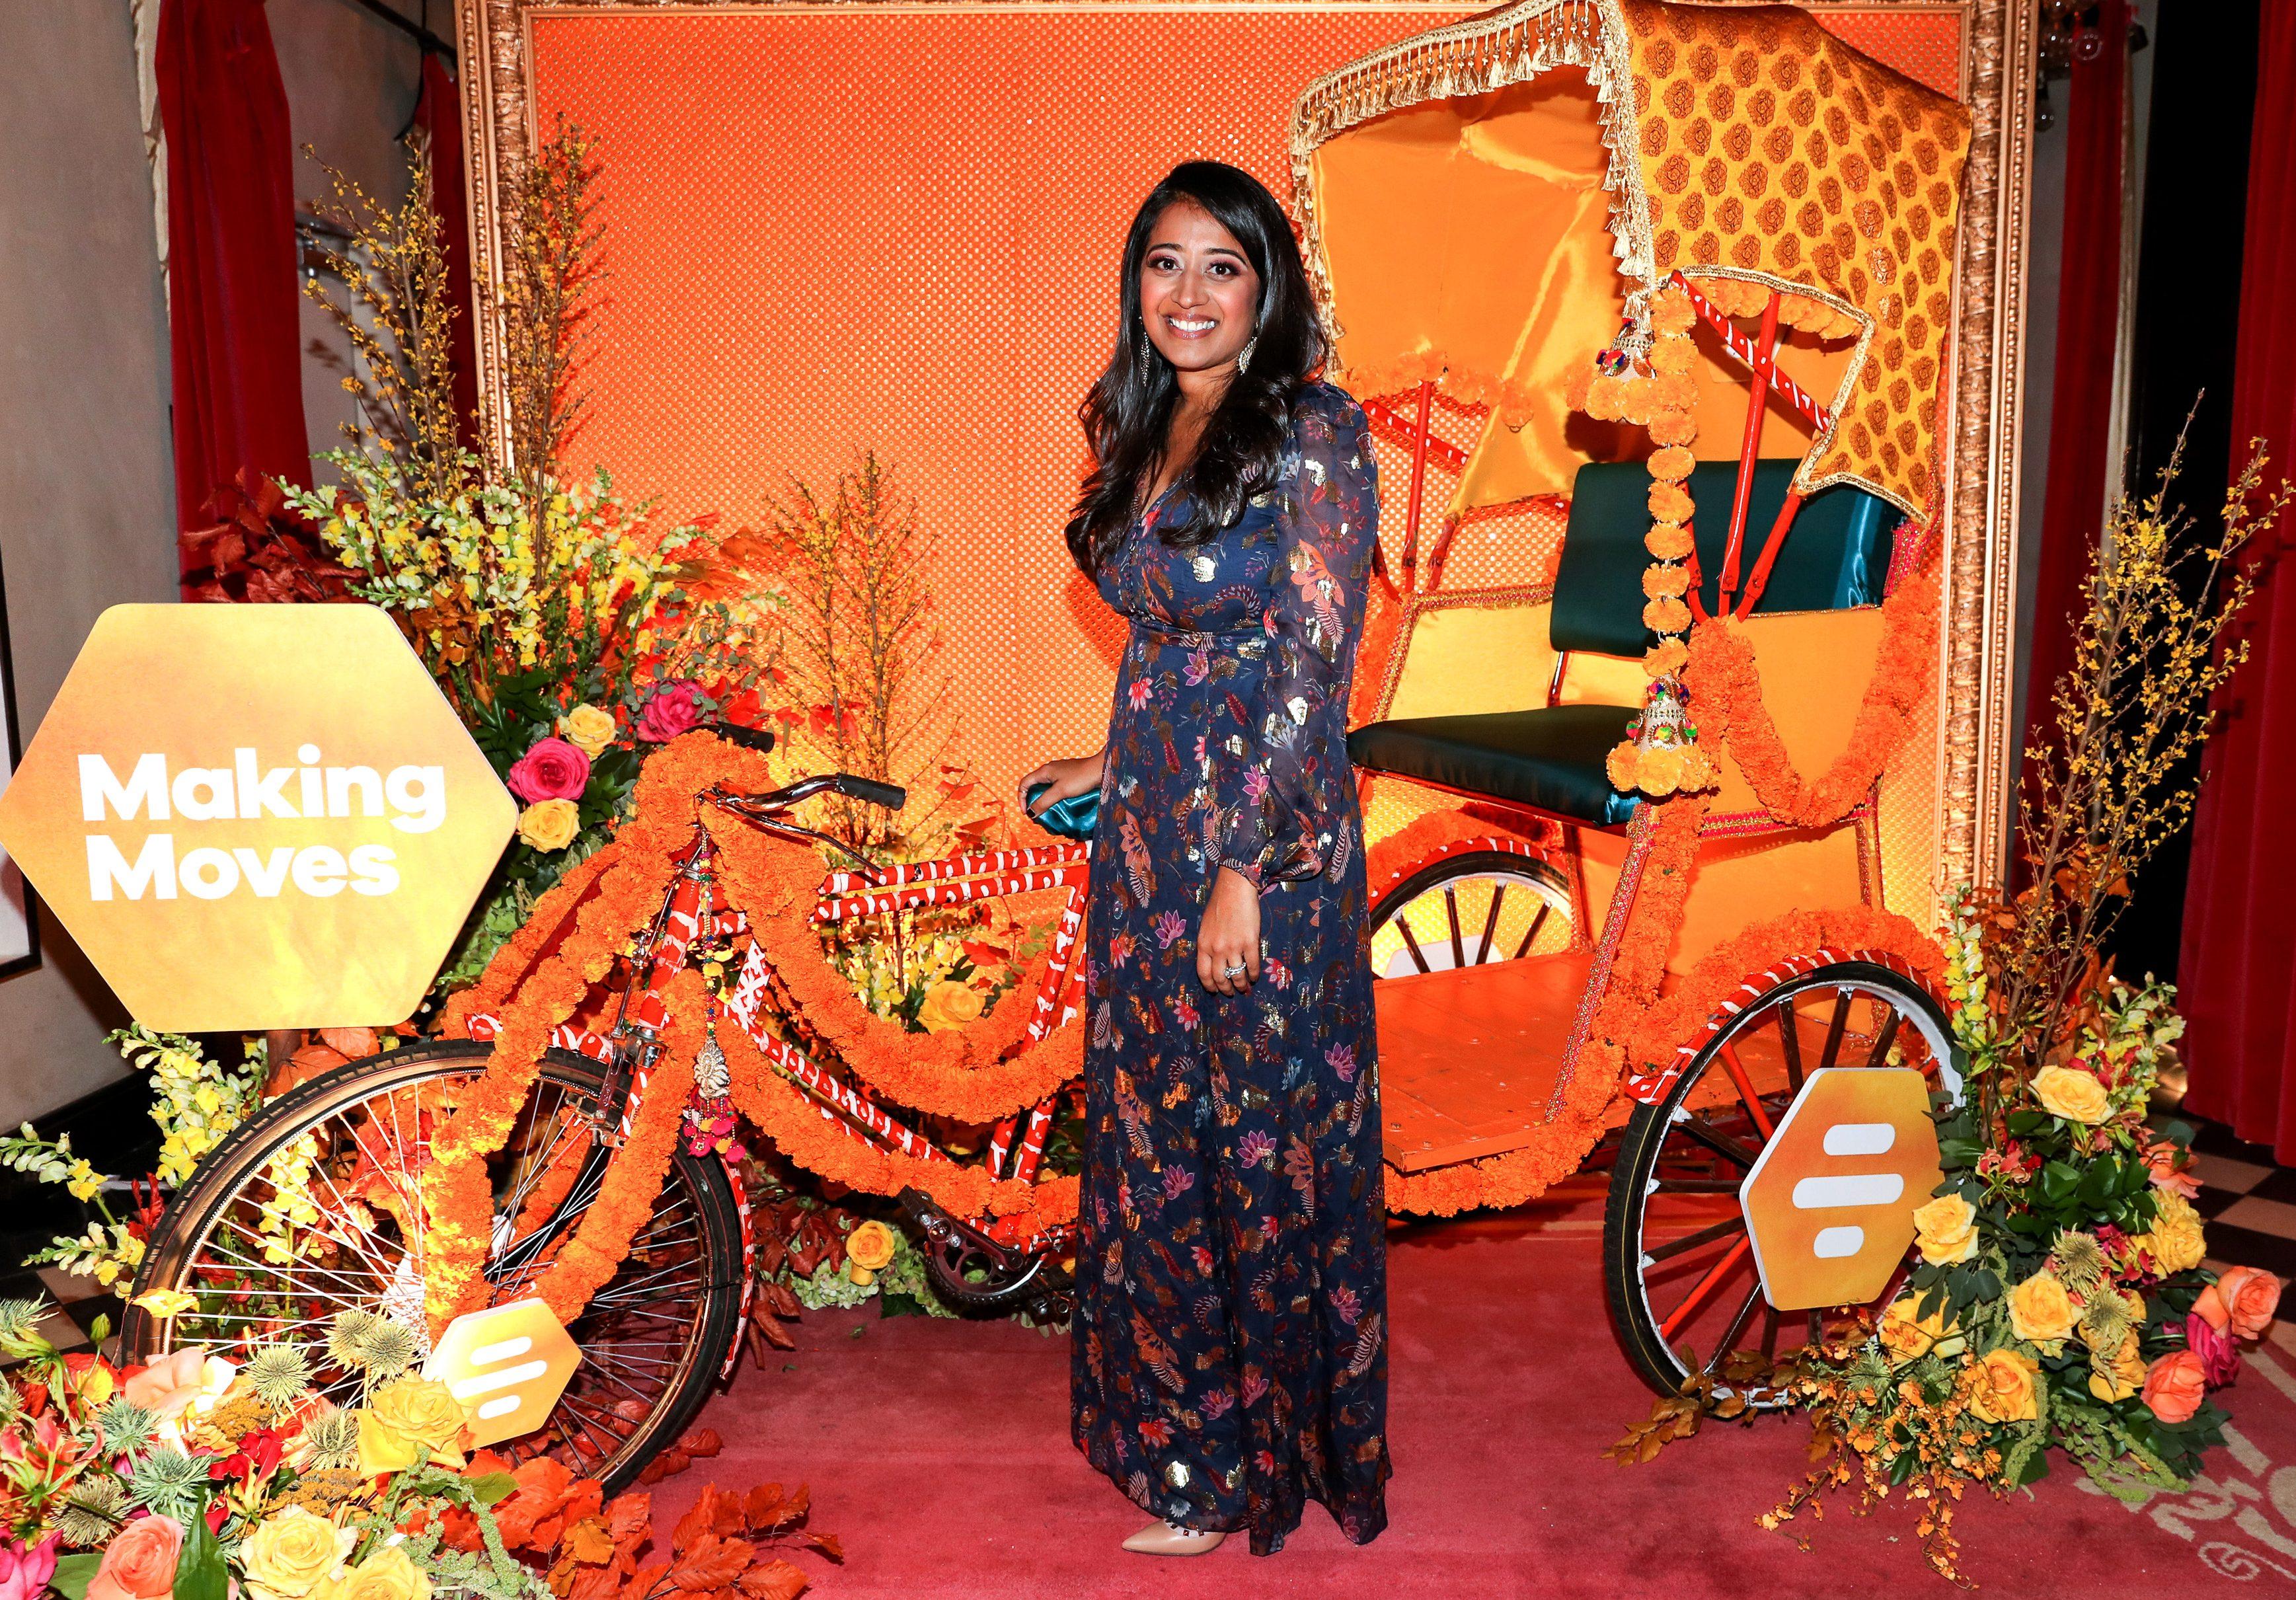 How Priyanka Chopra-backed dating app Bumble is winning India